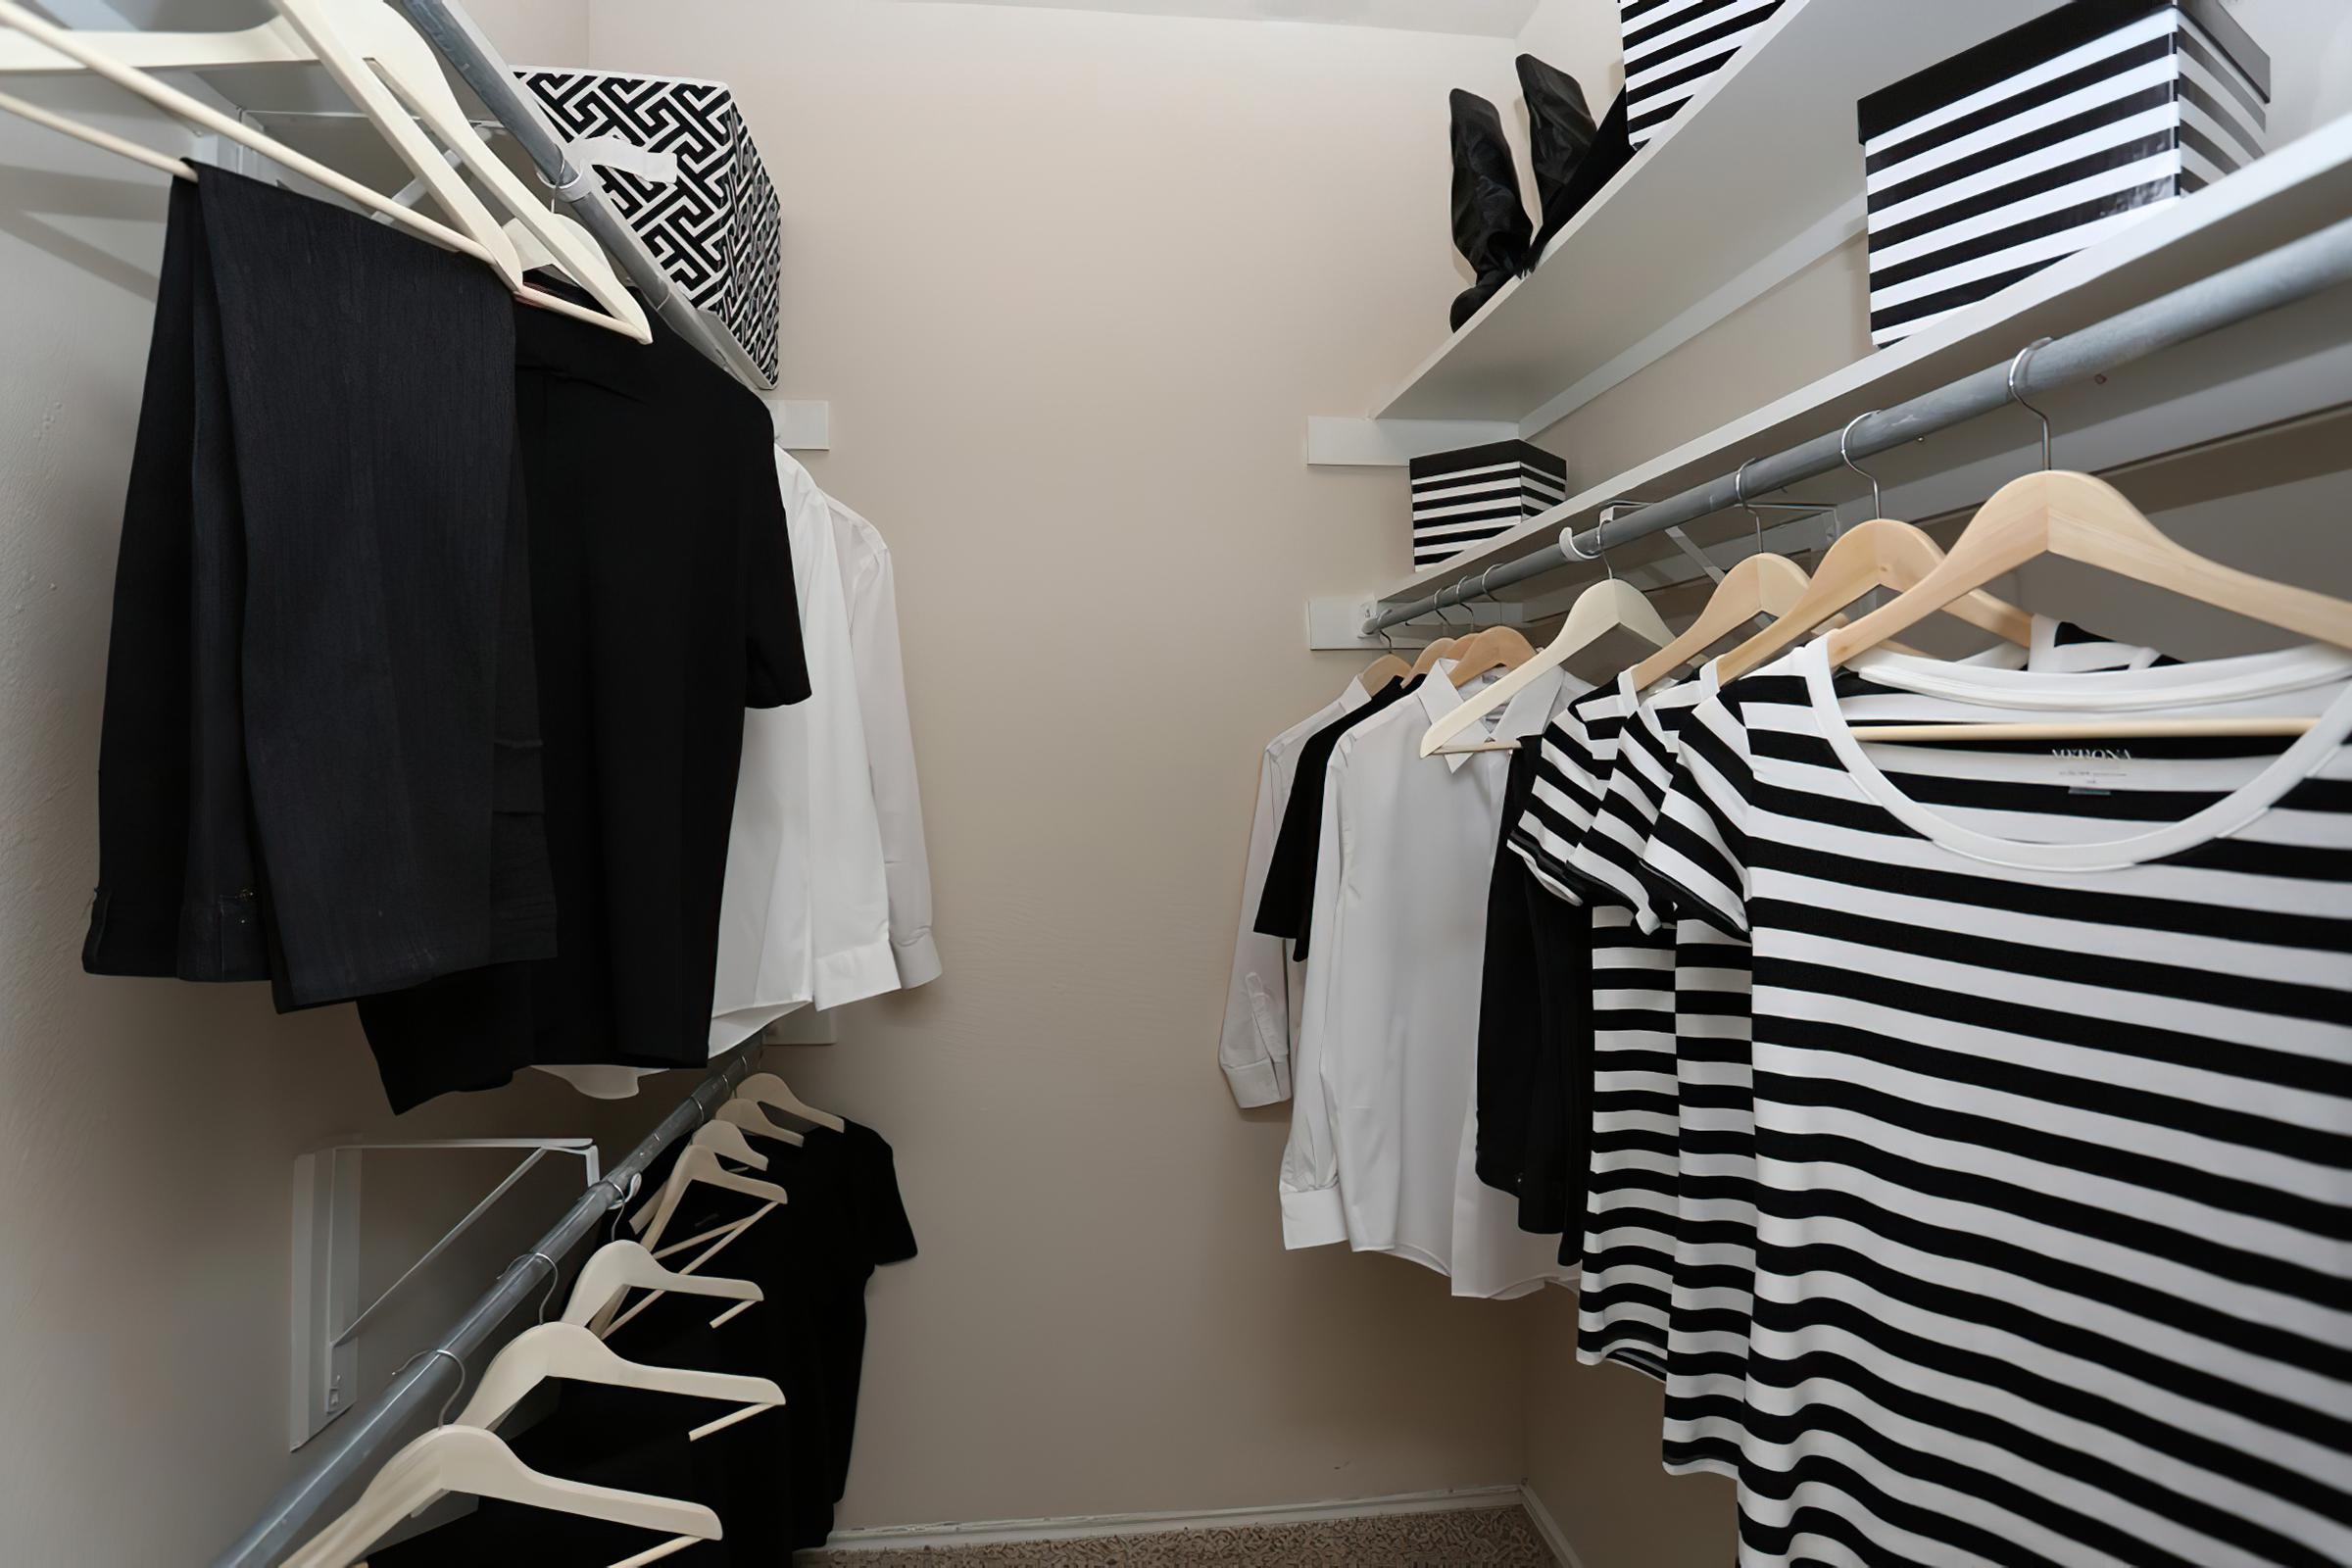 closet2x2wi-width-2400px.jpg